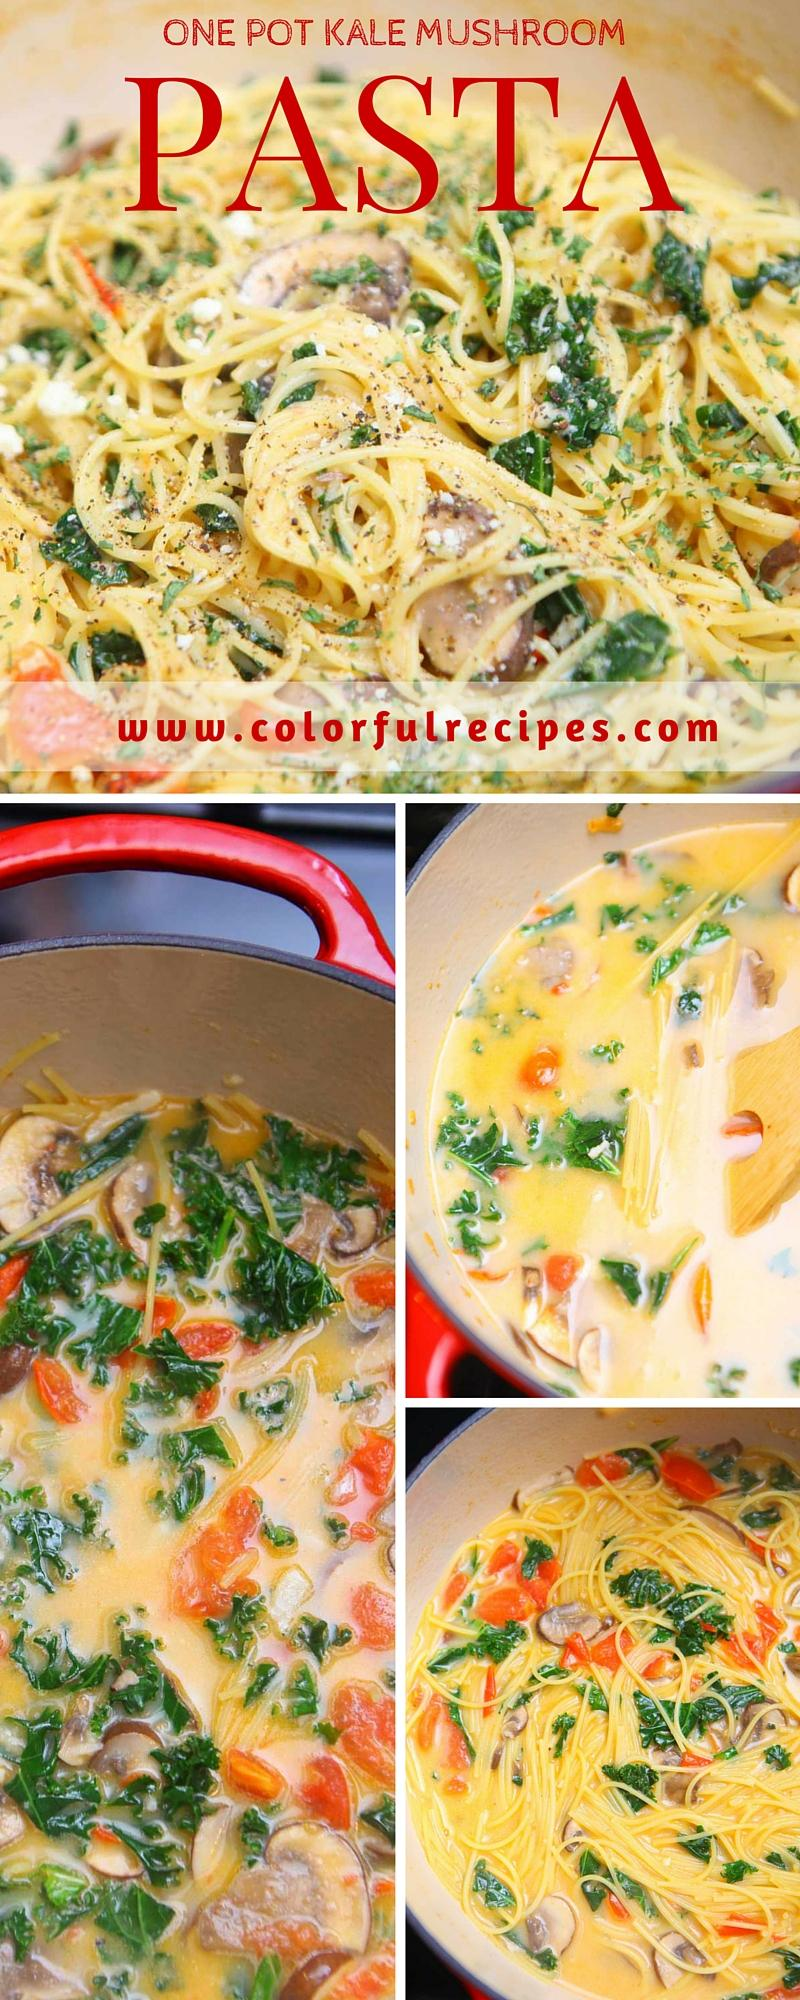 one pot kale mushroom pasta